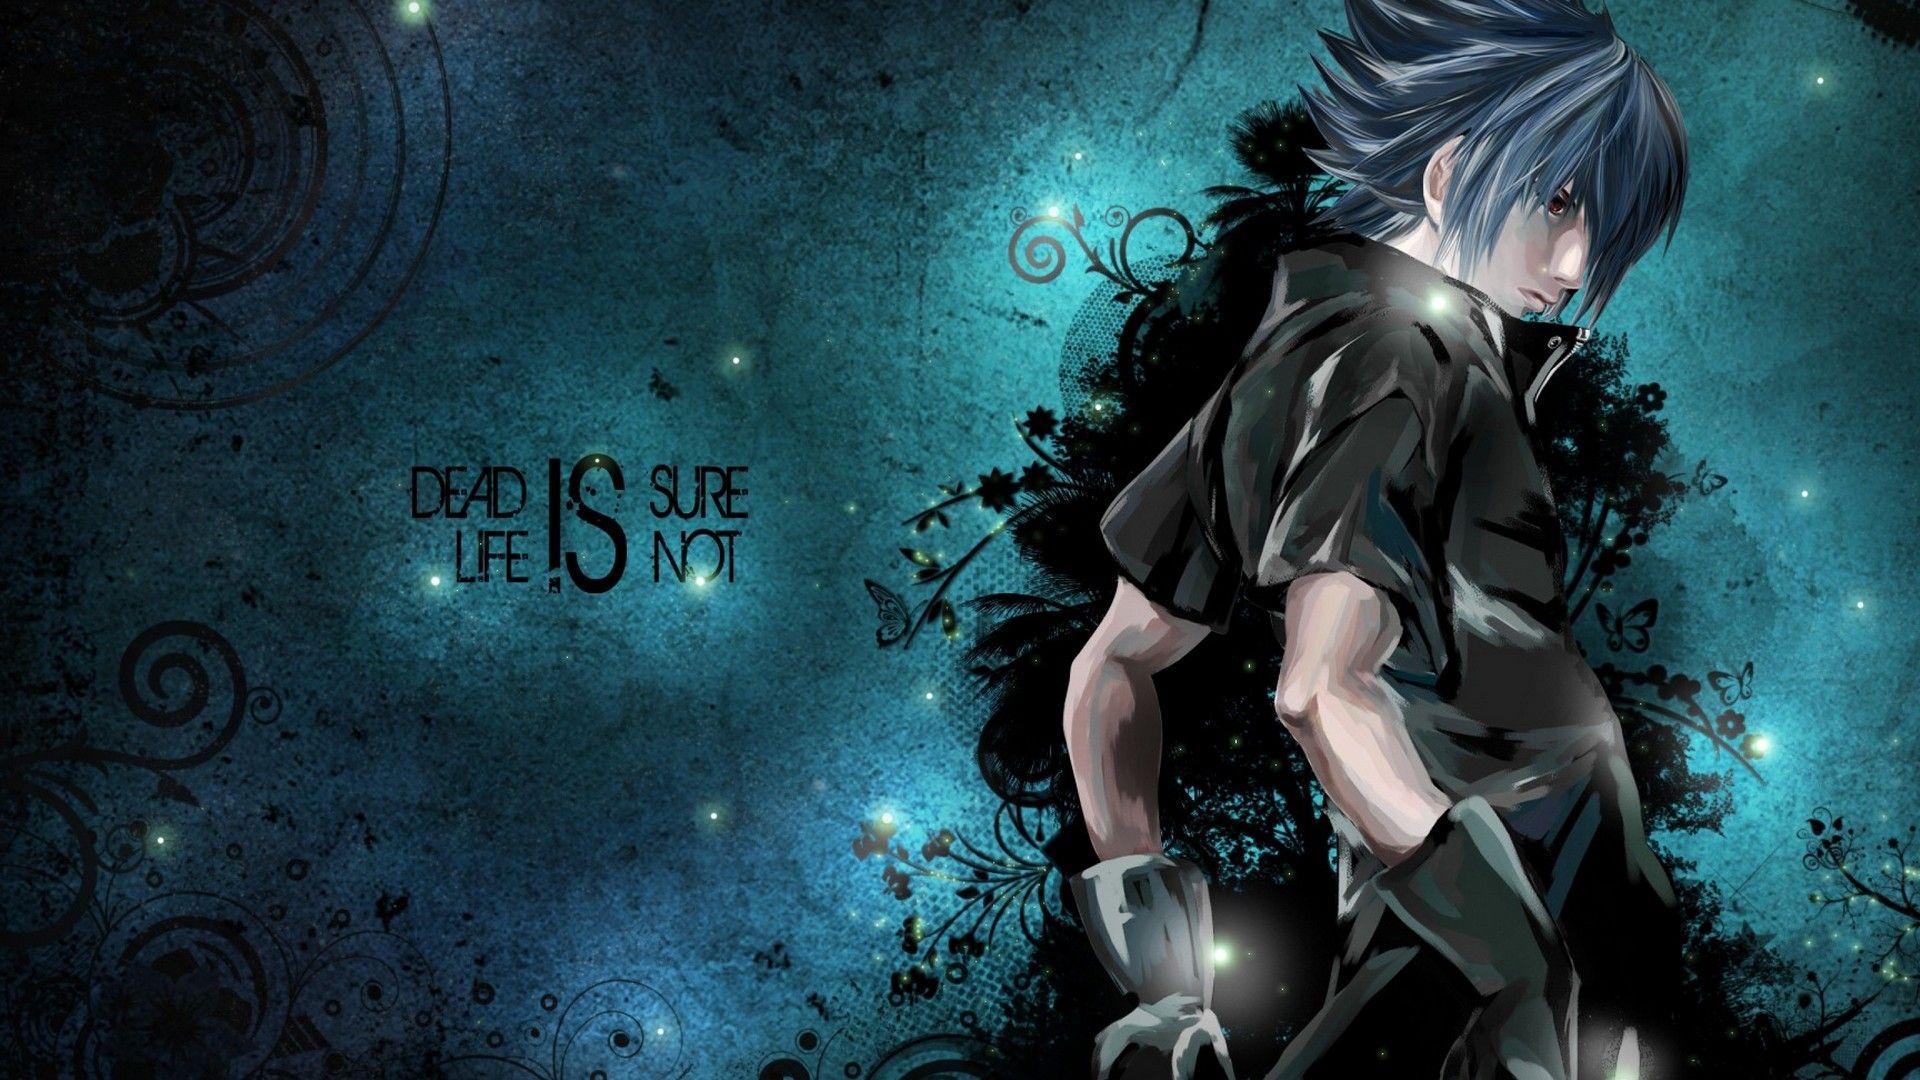 Anime Wallpaper Hd 2021 Live Wallpaper Hd Final Fantasy Wallpaper Hd Anime Wallpaper Hd Anime Wallpapers Epic anime wallpaper full hd